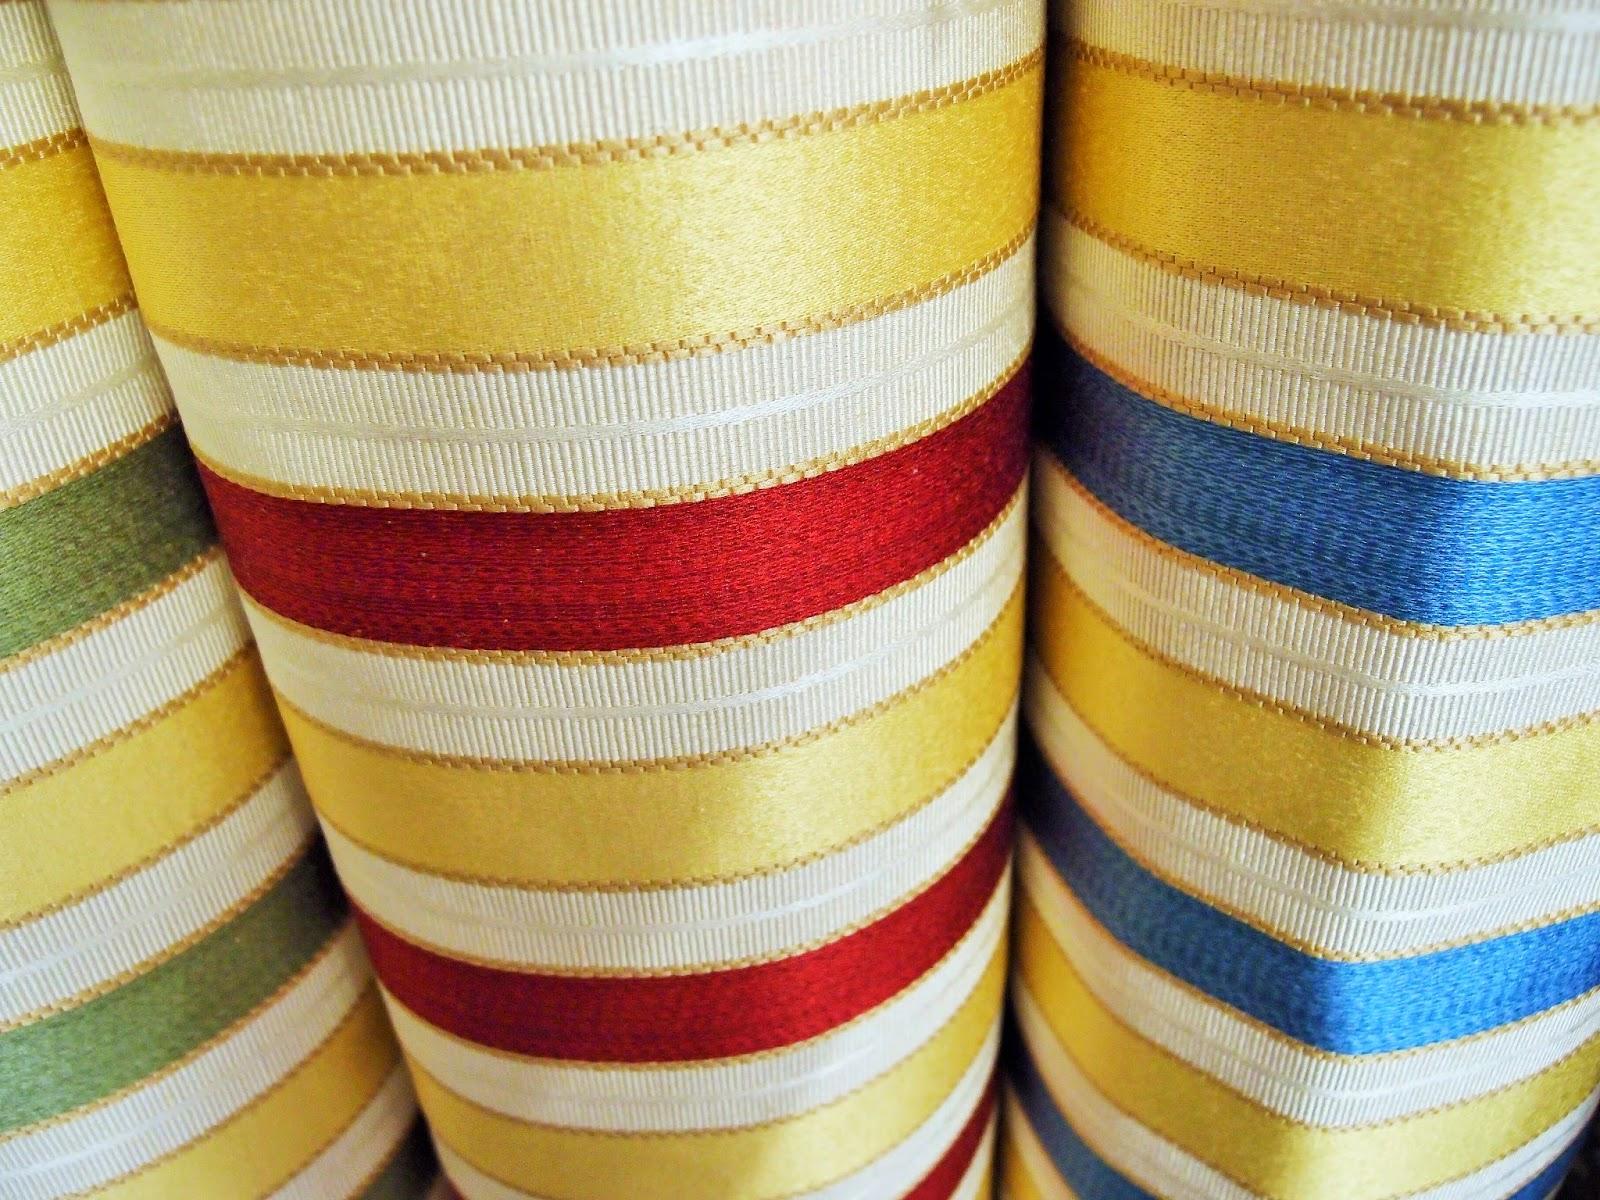 Tende e tessuti classici tradizionali tessuti tradizionali per applicazioni su sedie antiche e tappezzerie tesate murali come una volta dal fascino floreale di minuziosi disegni. I Classici Tessuti Per Tappezzare Mobili Antichi Antichita Bellini